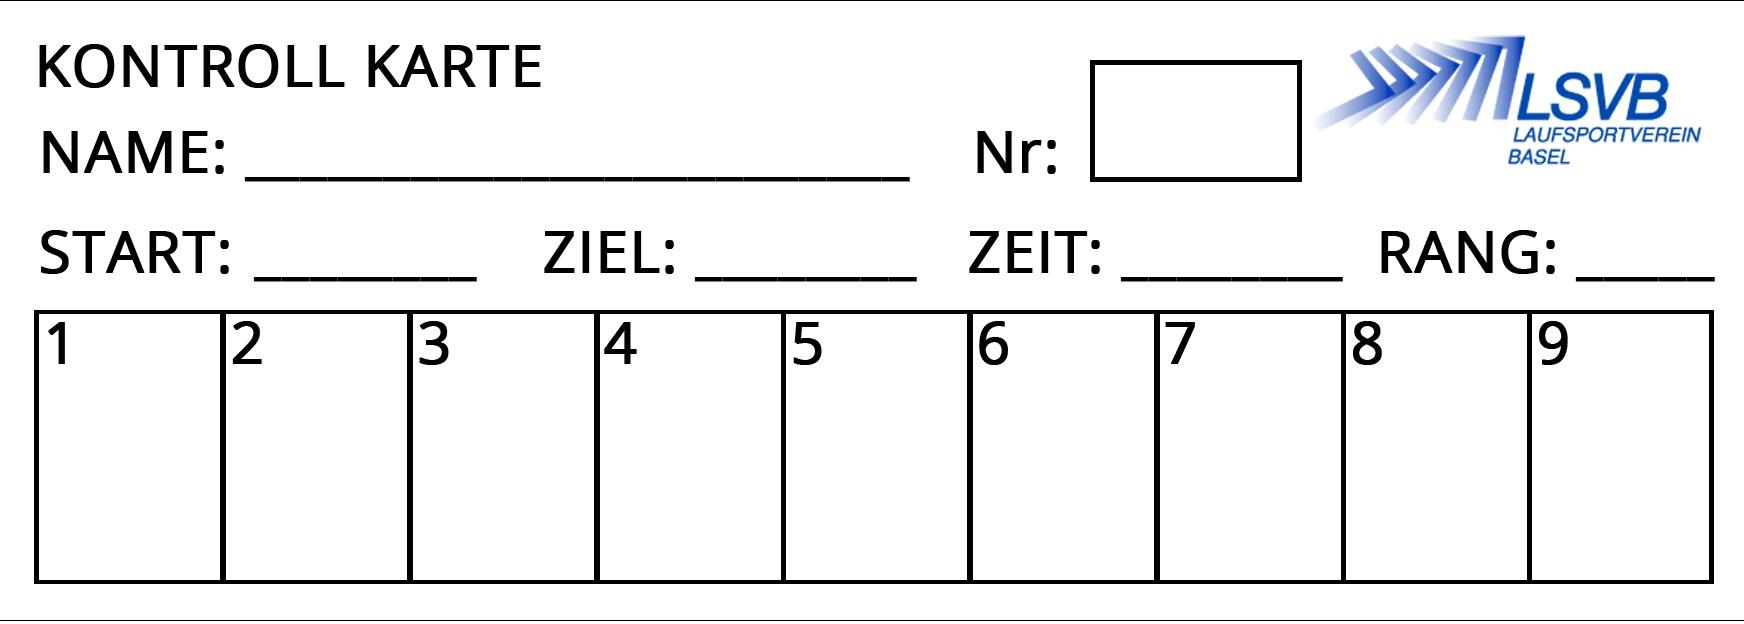 kontrollkarte